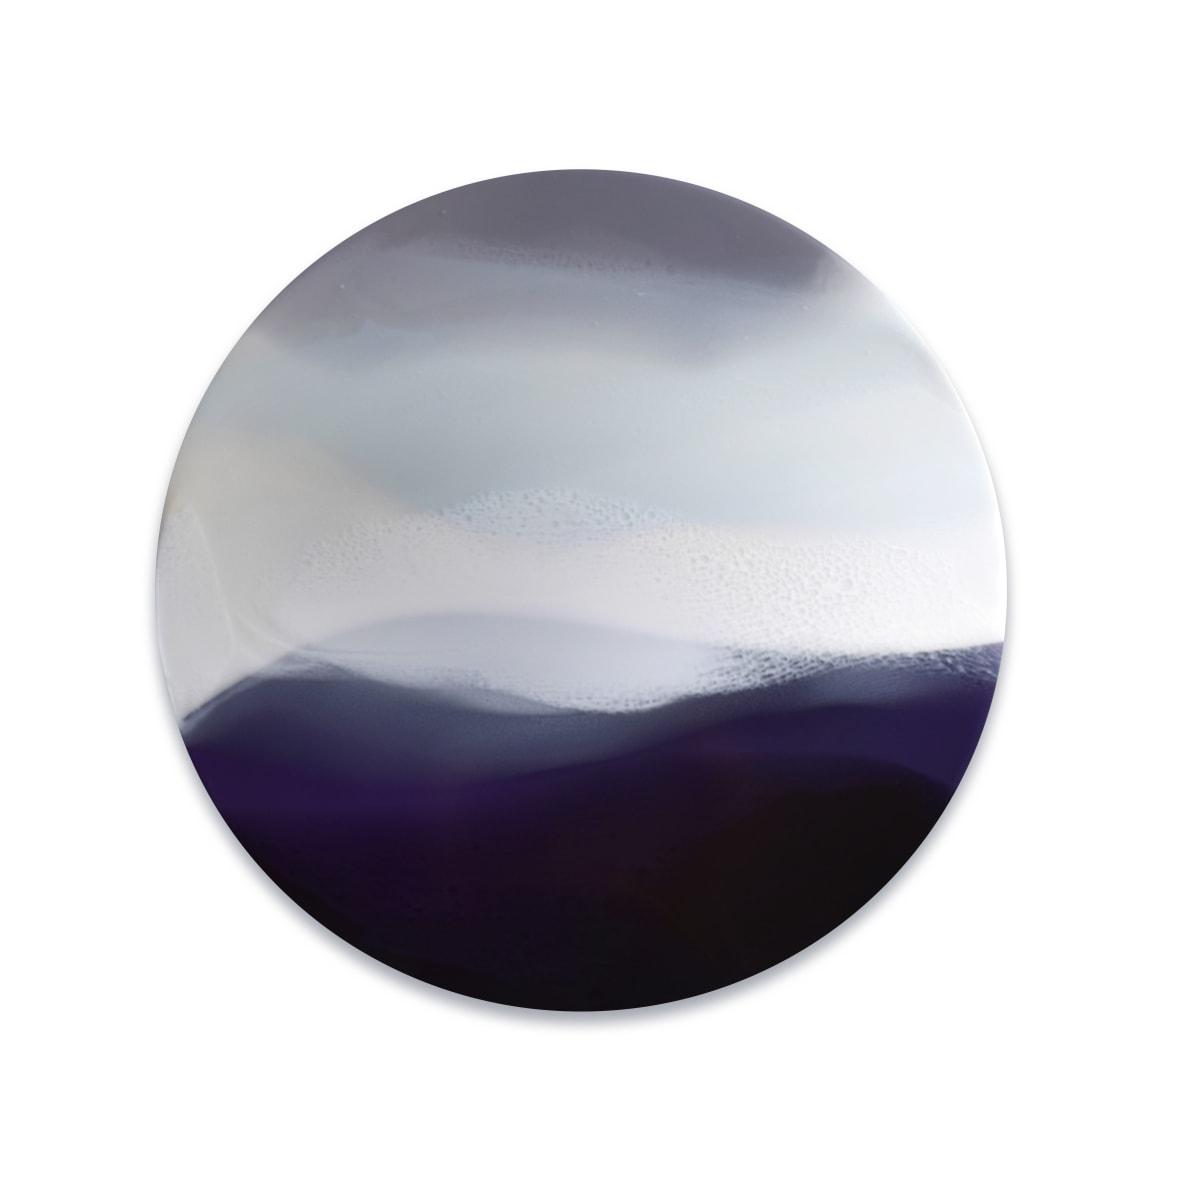 Marina Savashynskaya Dunbar Landless III, 2019 Mixed Media on Panel 61 cm diameter 24 in diameter